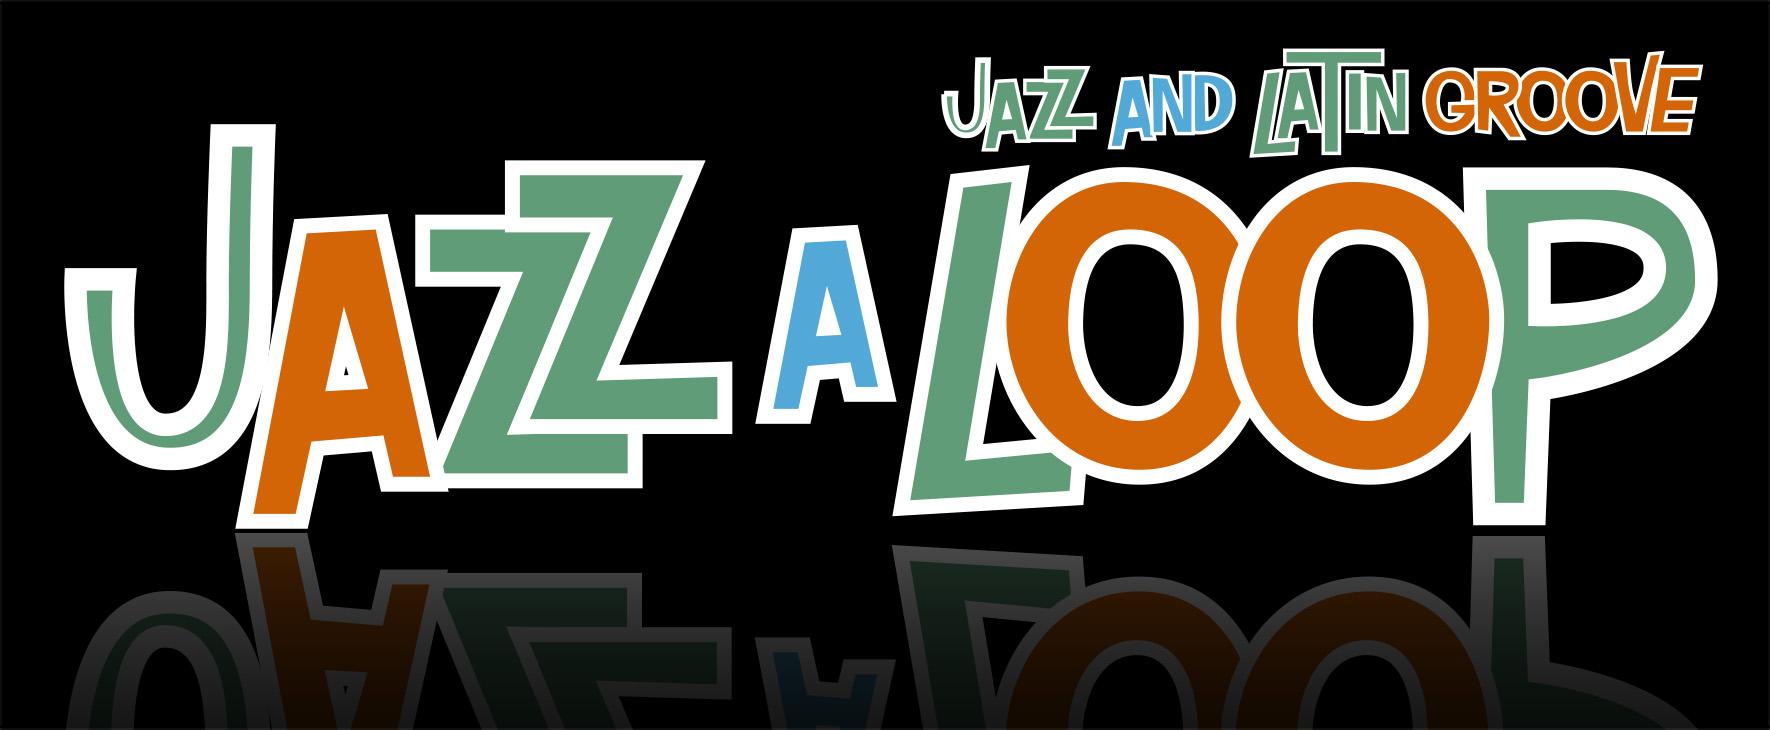 Jazzaloop - - Mw communication - Graphiste Webmaster Montauban Toulouse